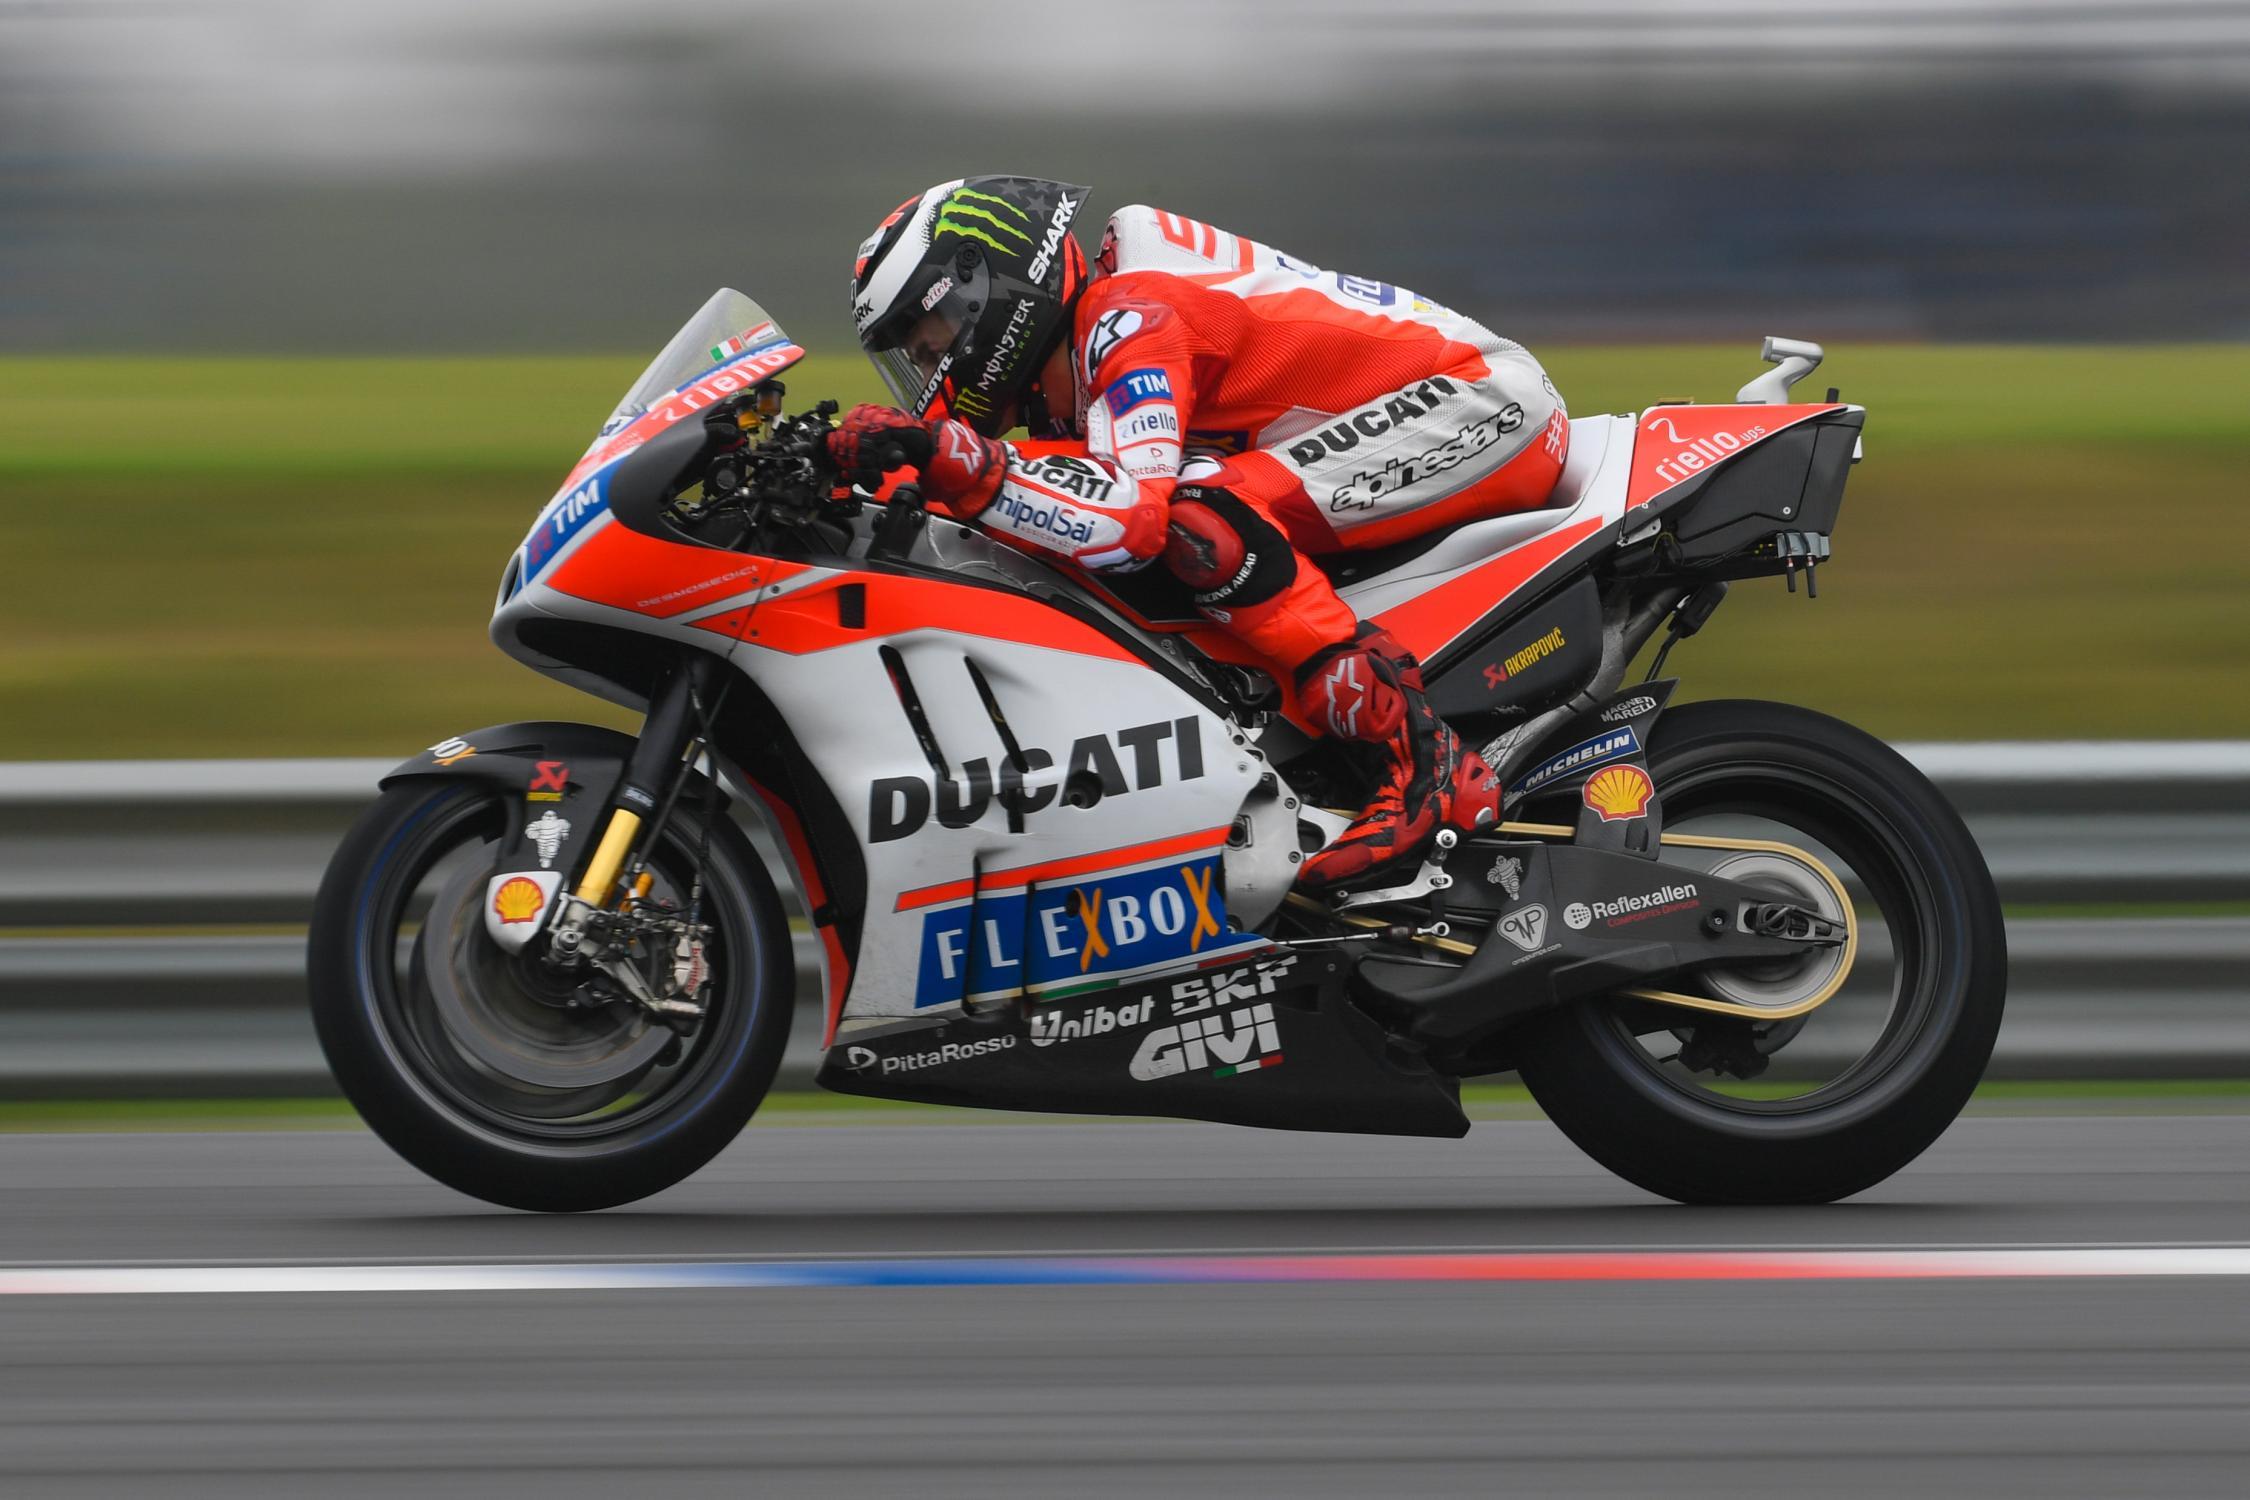 [MotoGP] Argentine 99-jorge-lorenzo-esplg5_6875.gallery_full_top_fullscreen